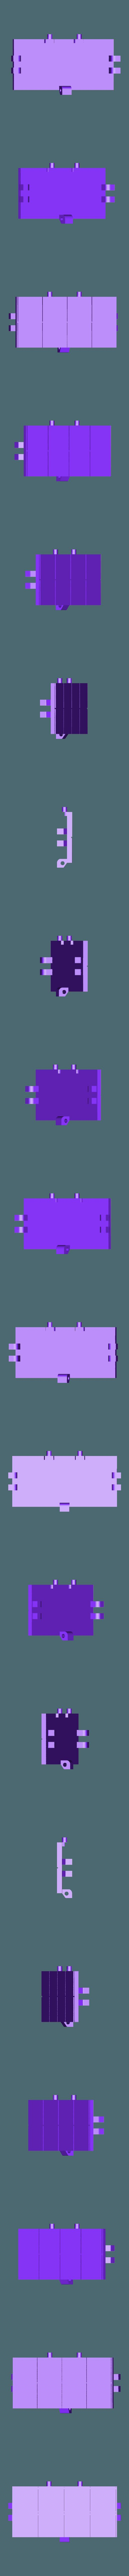 Parte_lateral_larga.stl Download free STL file Tablero de ajedrez desplegable • 3D print object, alexanderegido